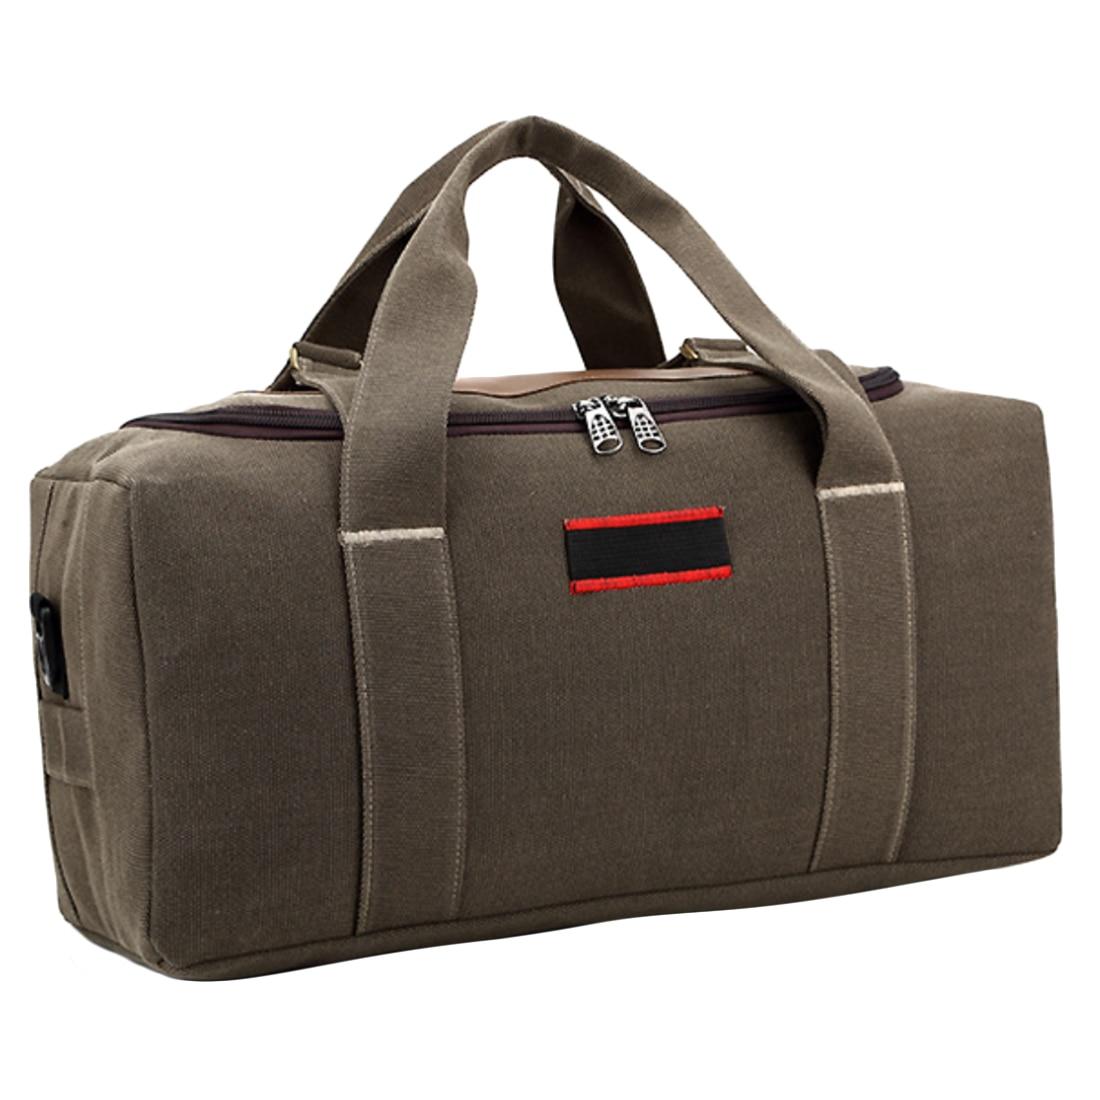 HIPSTEEN Large Capacity Canvas Men's Women Travel Bags Cross-body Bag Handbag Luggage Bag Men Travel Bags - Size S / L Hot Sale 6